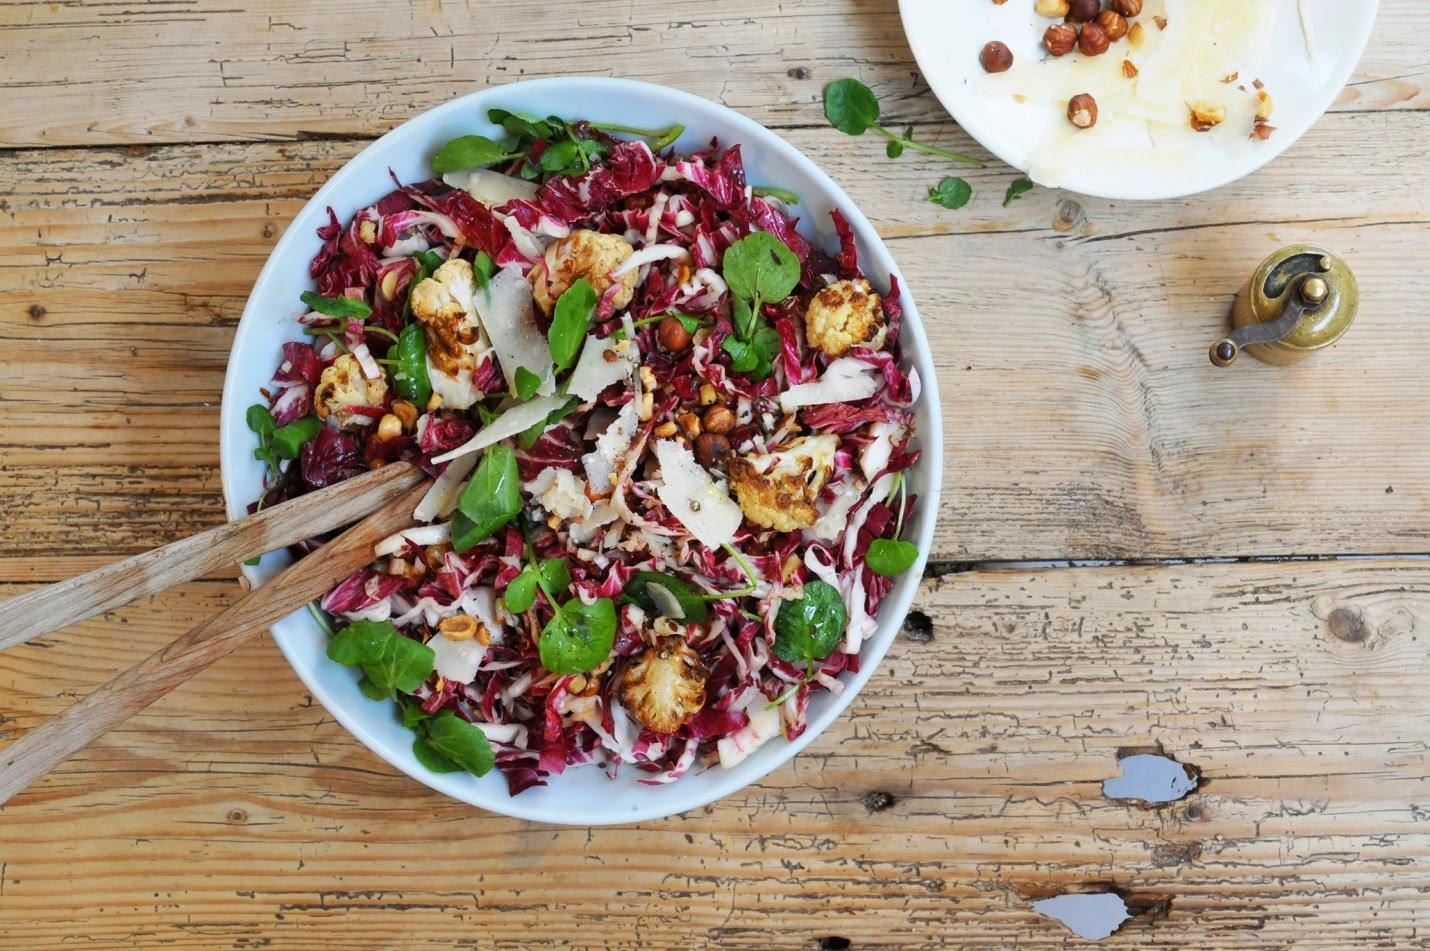 ... Carb Diabetic: A Great Winter Salad - Warm Cauliflower and Radicchio